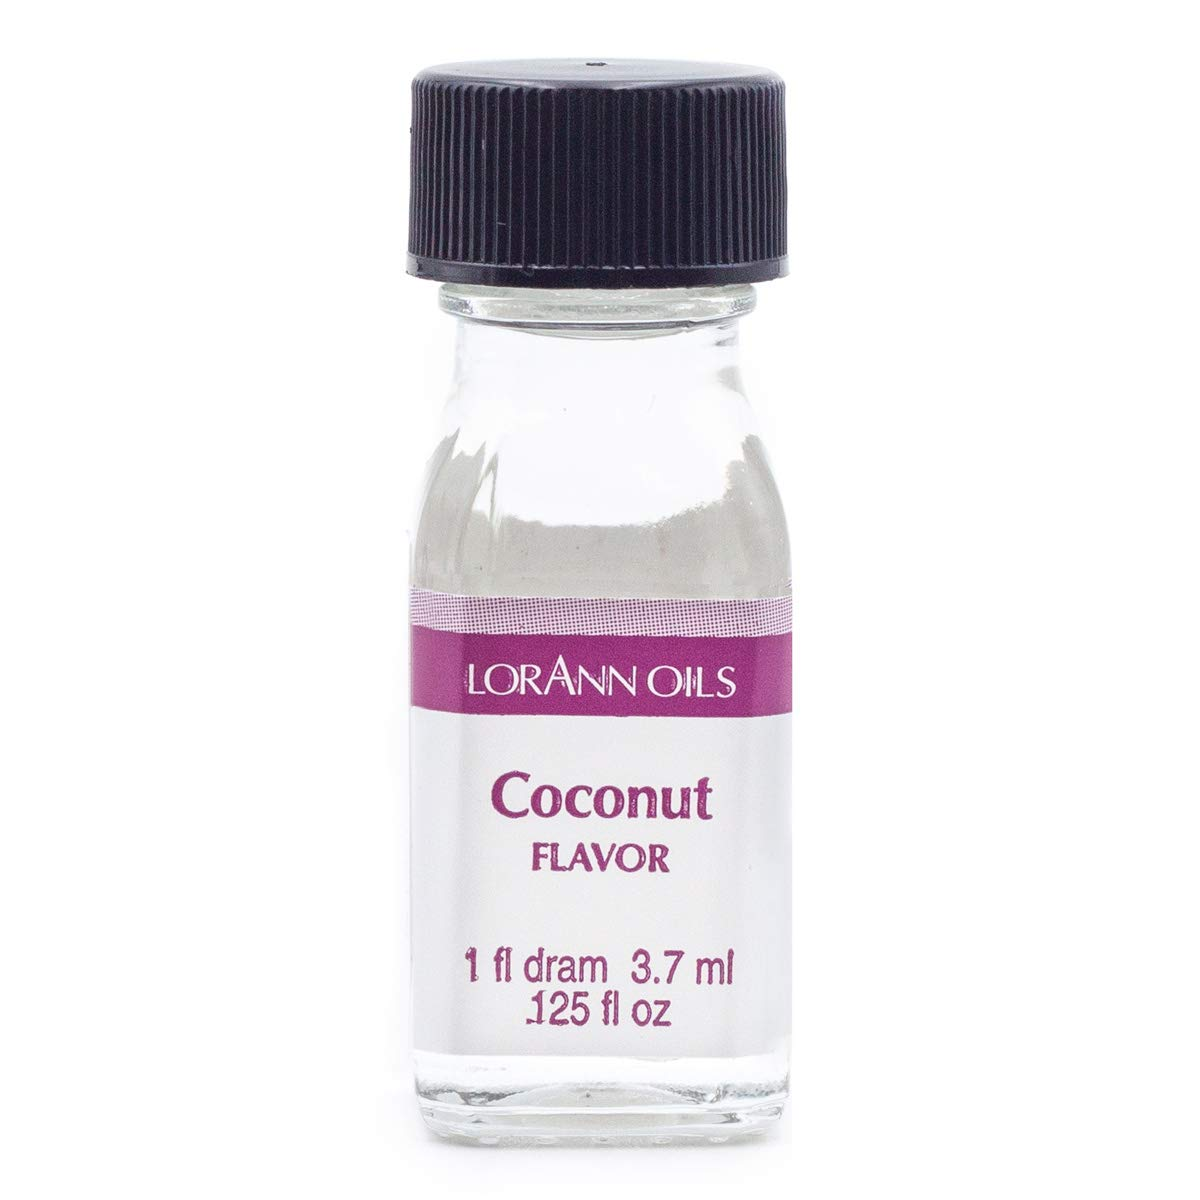 LorAnn Coconut Super Strength Flavor, 1 dram bottle (.0125 fl oz - 3.7ml)